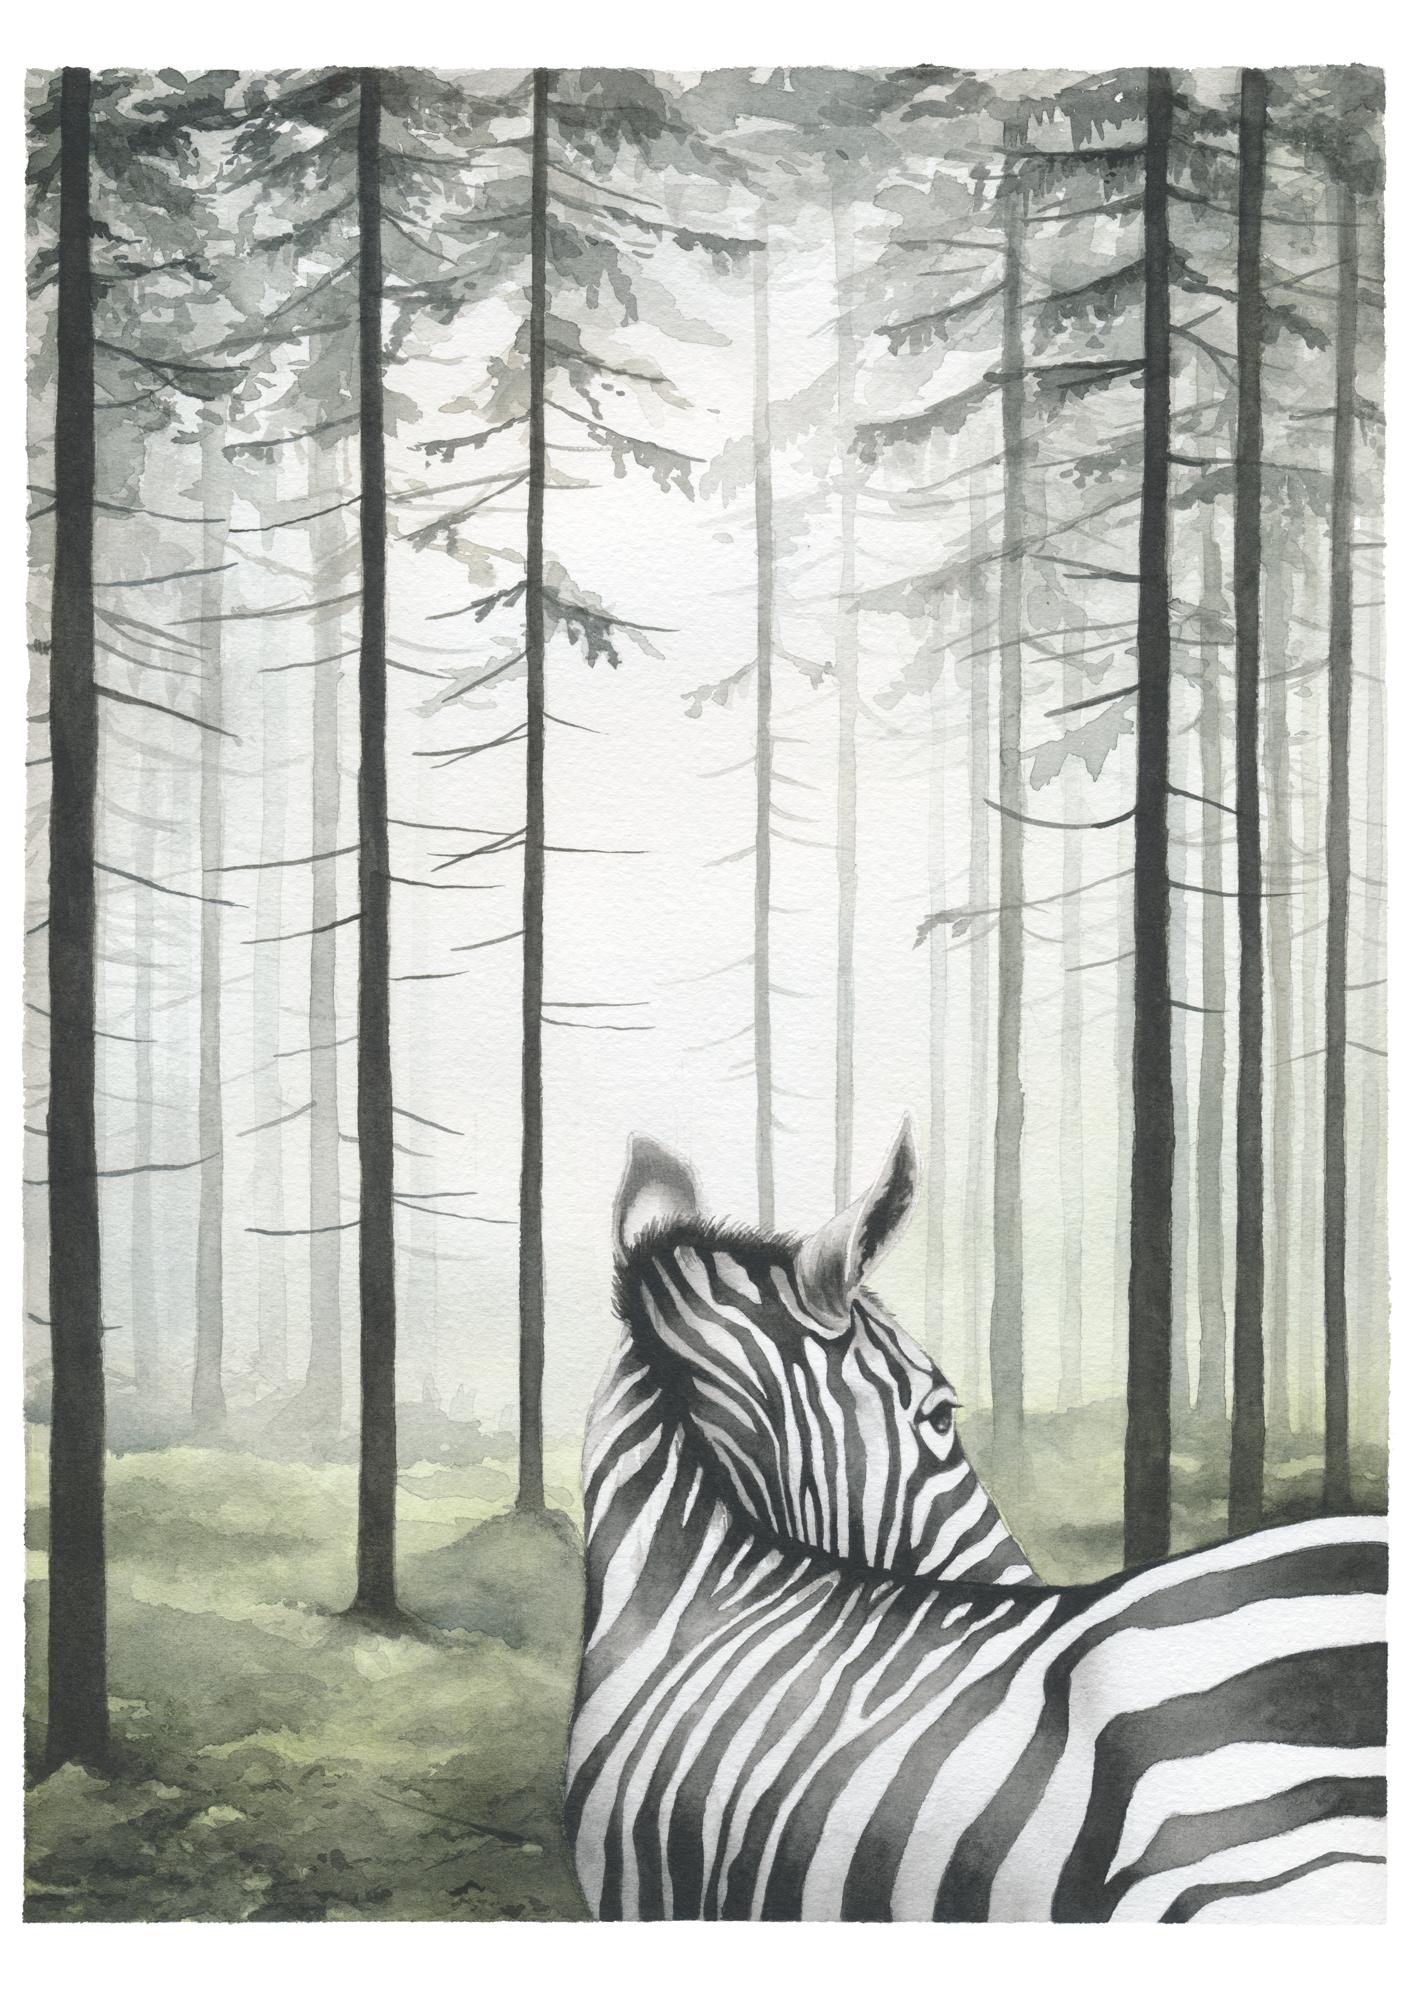 Lost Zebra